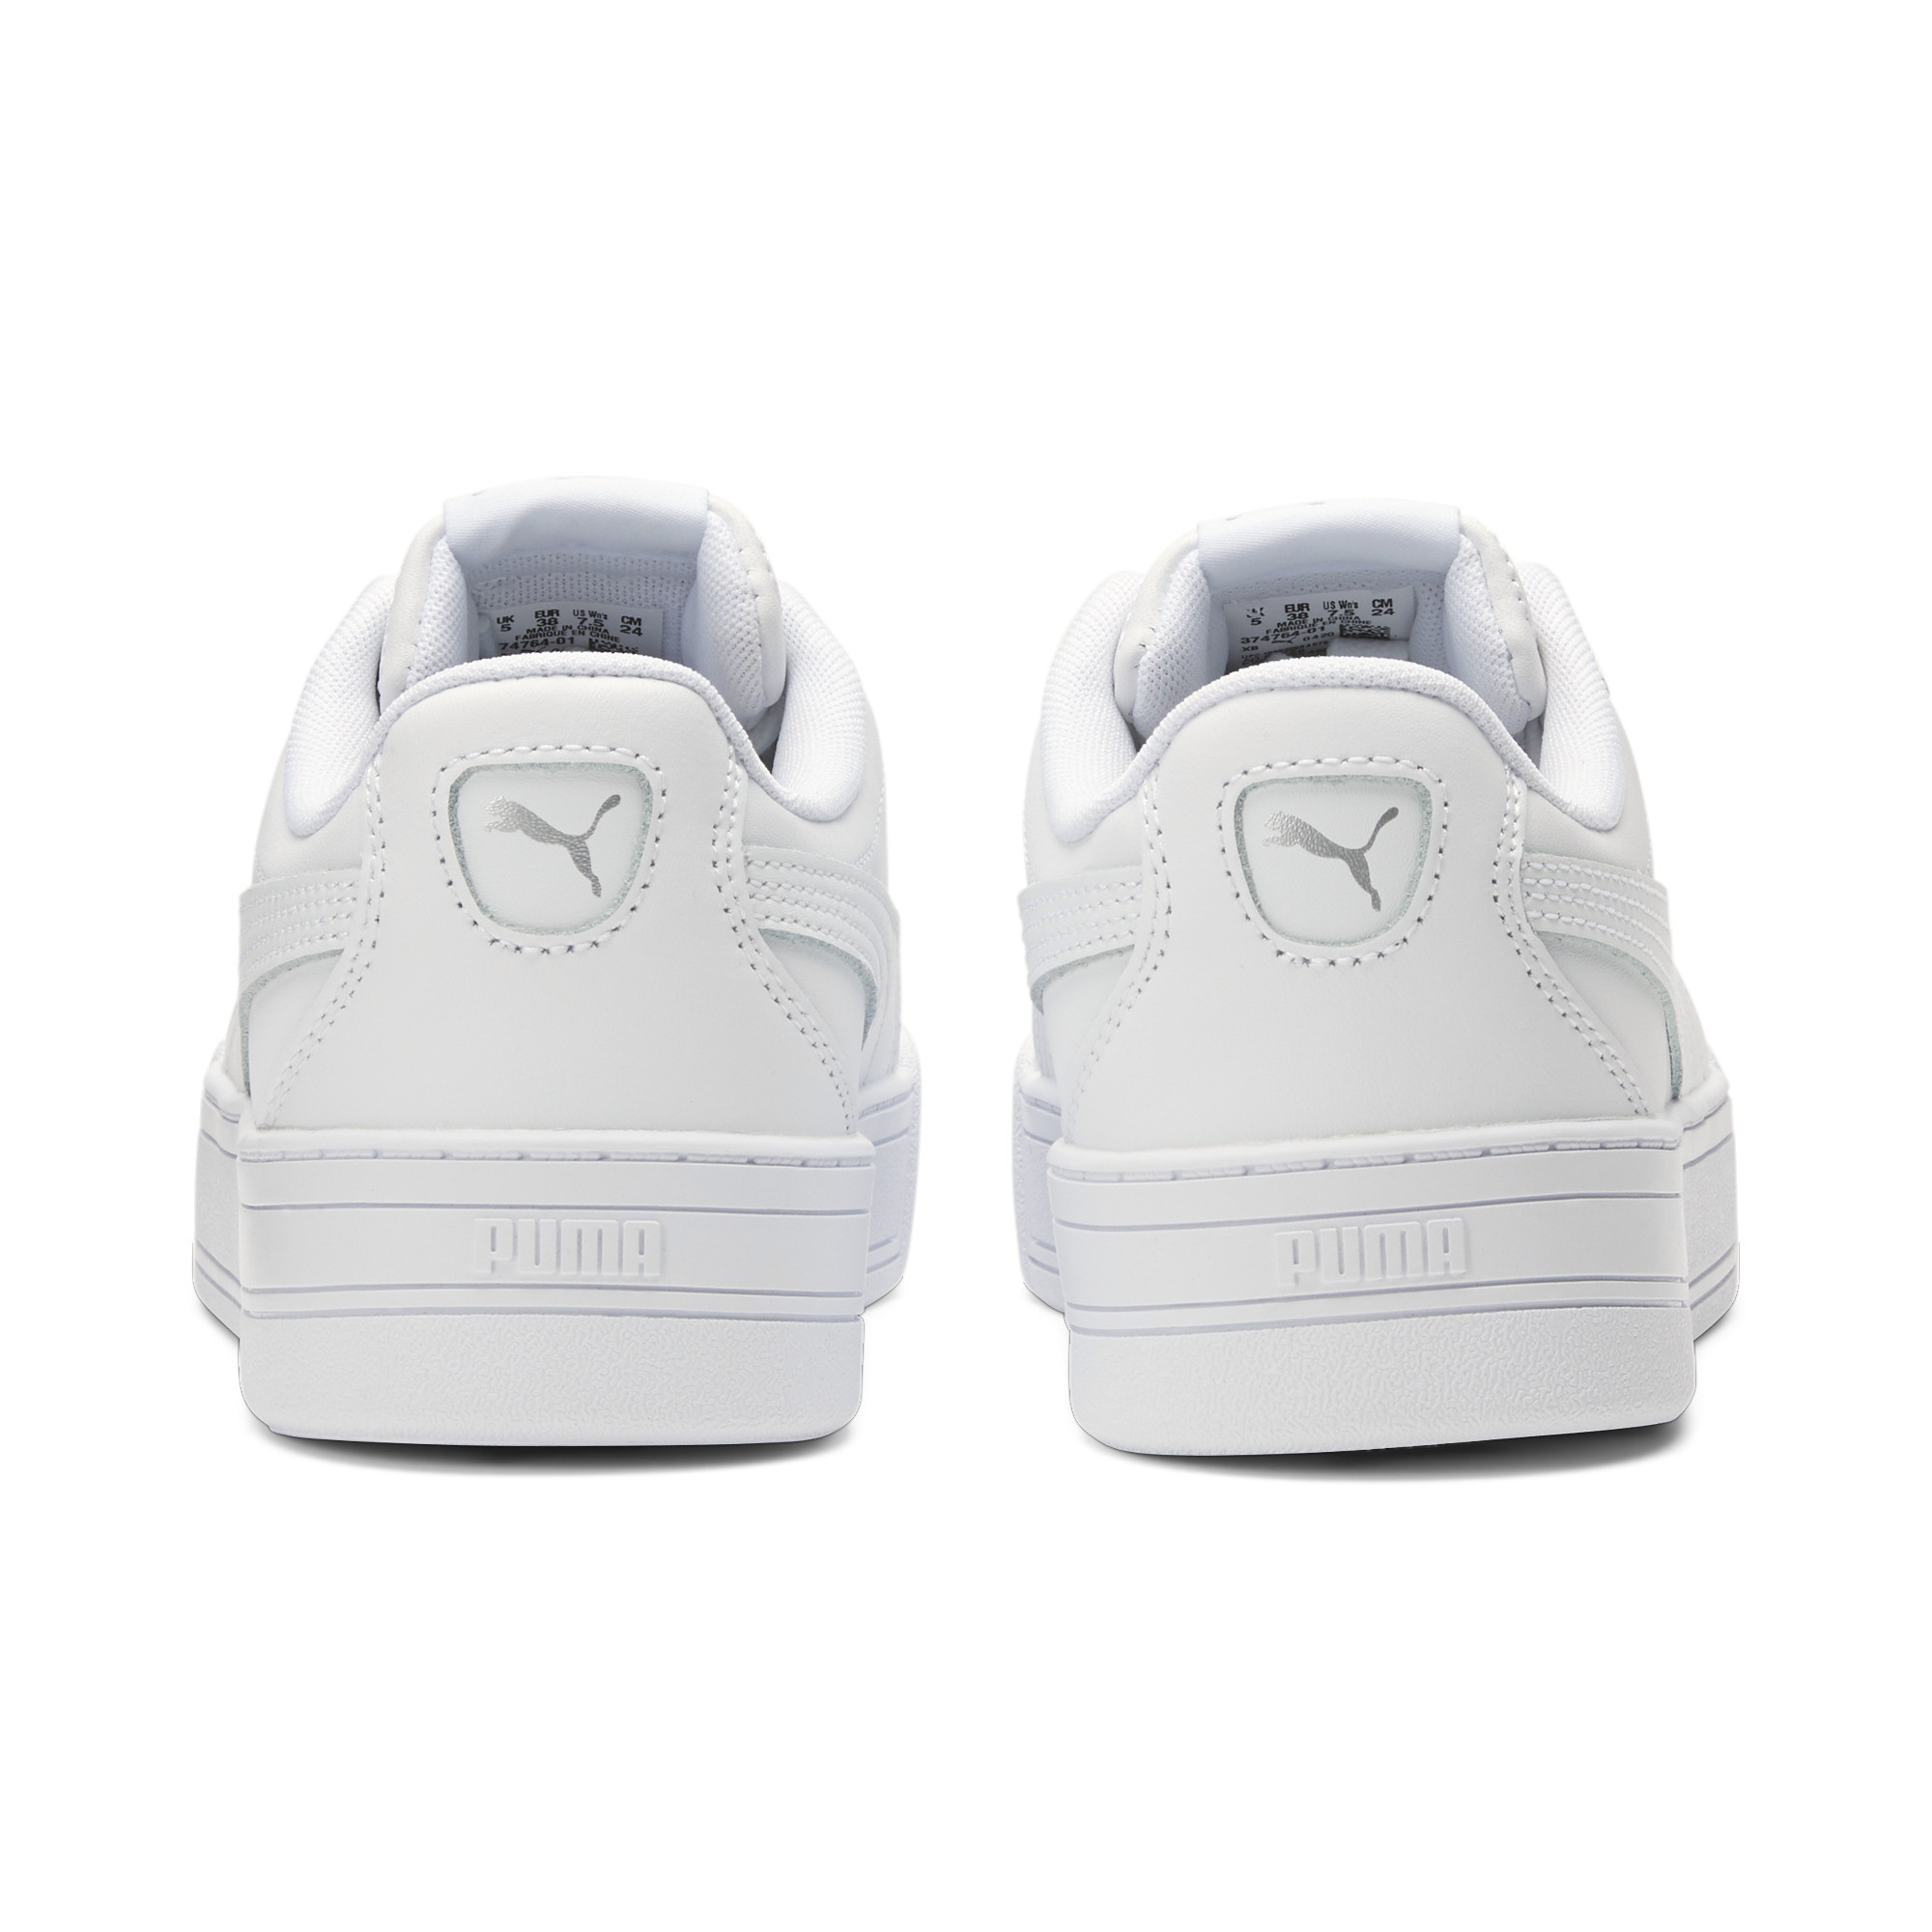 PUMA-Women-039-s-Skye-Sneakers thumbnail 15